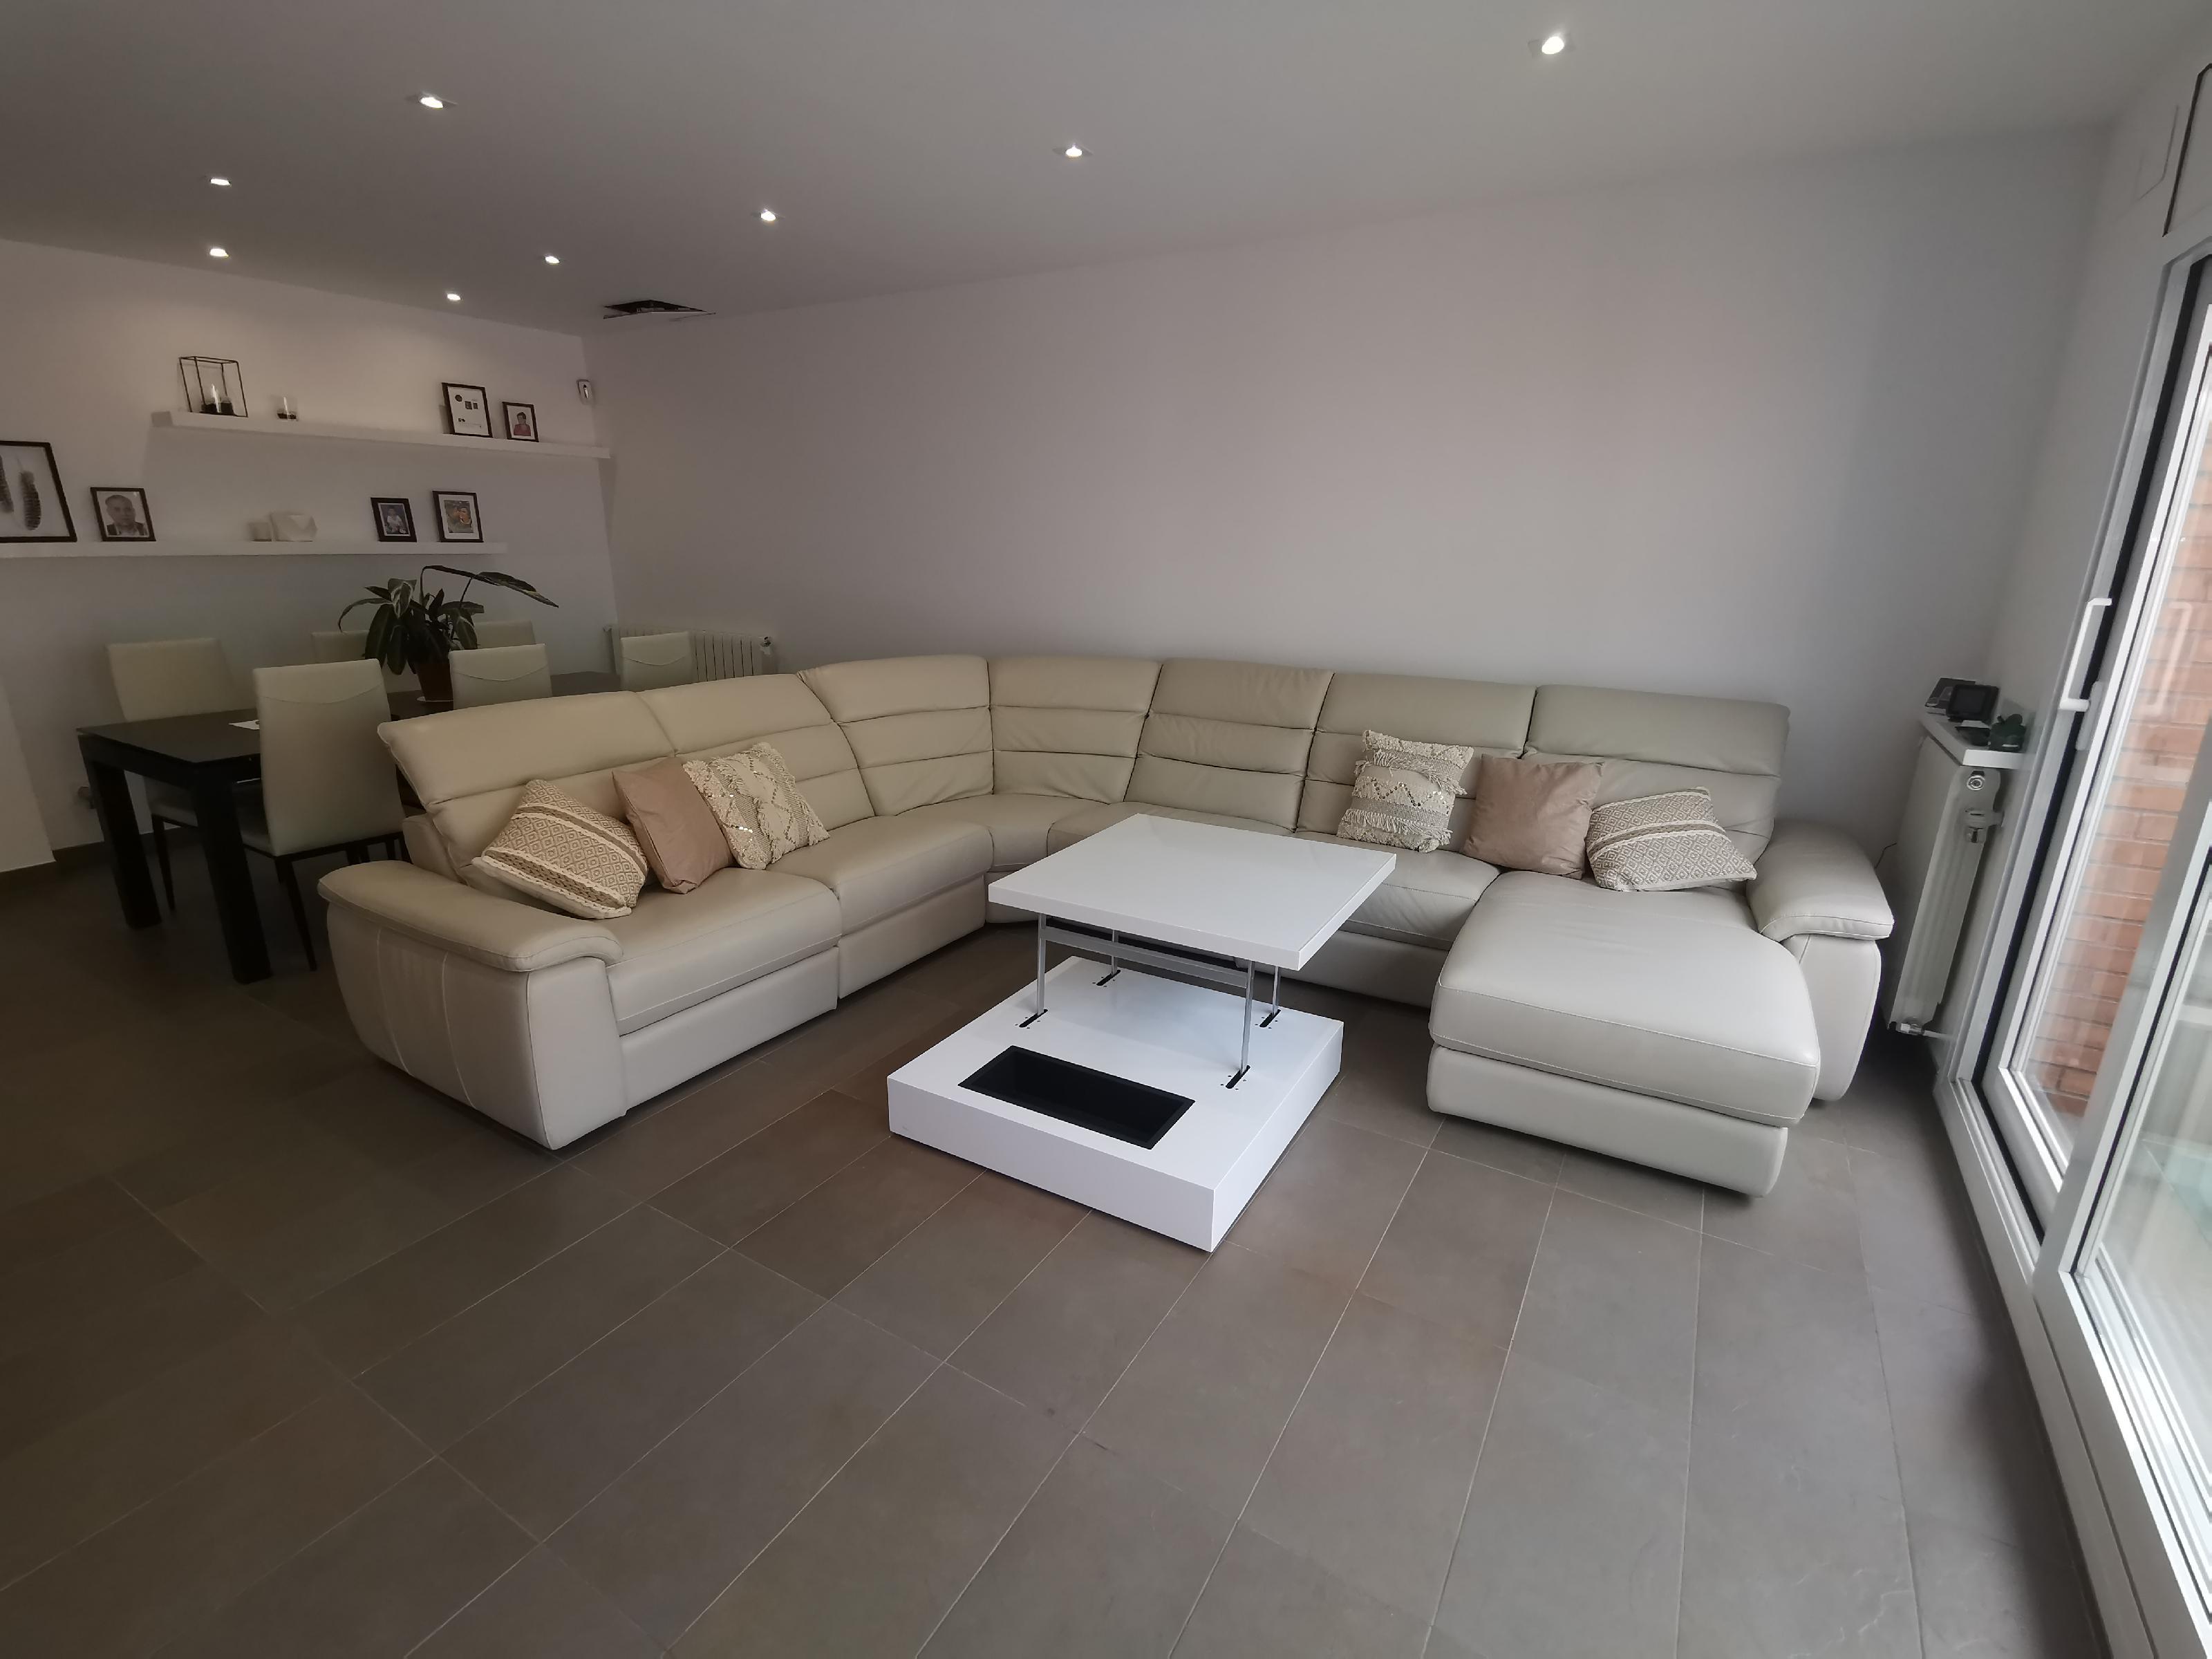 Imagen 4 Casa Adosada en venta en Badalona / Bonavista badalona